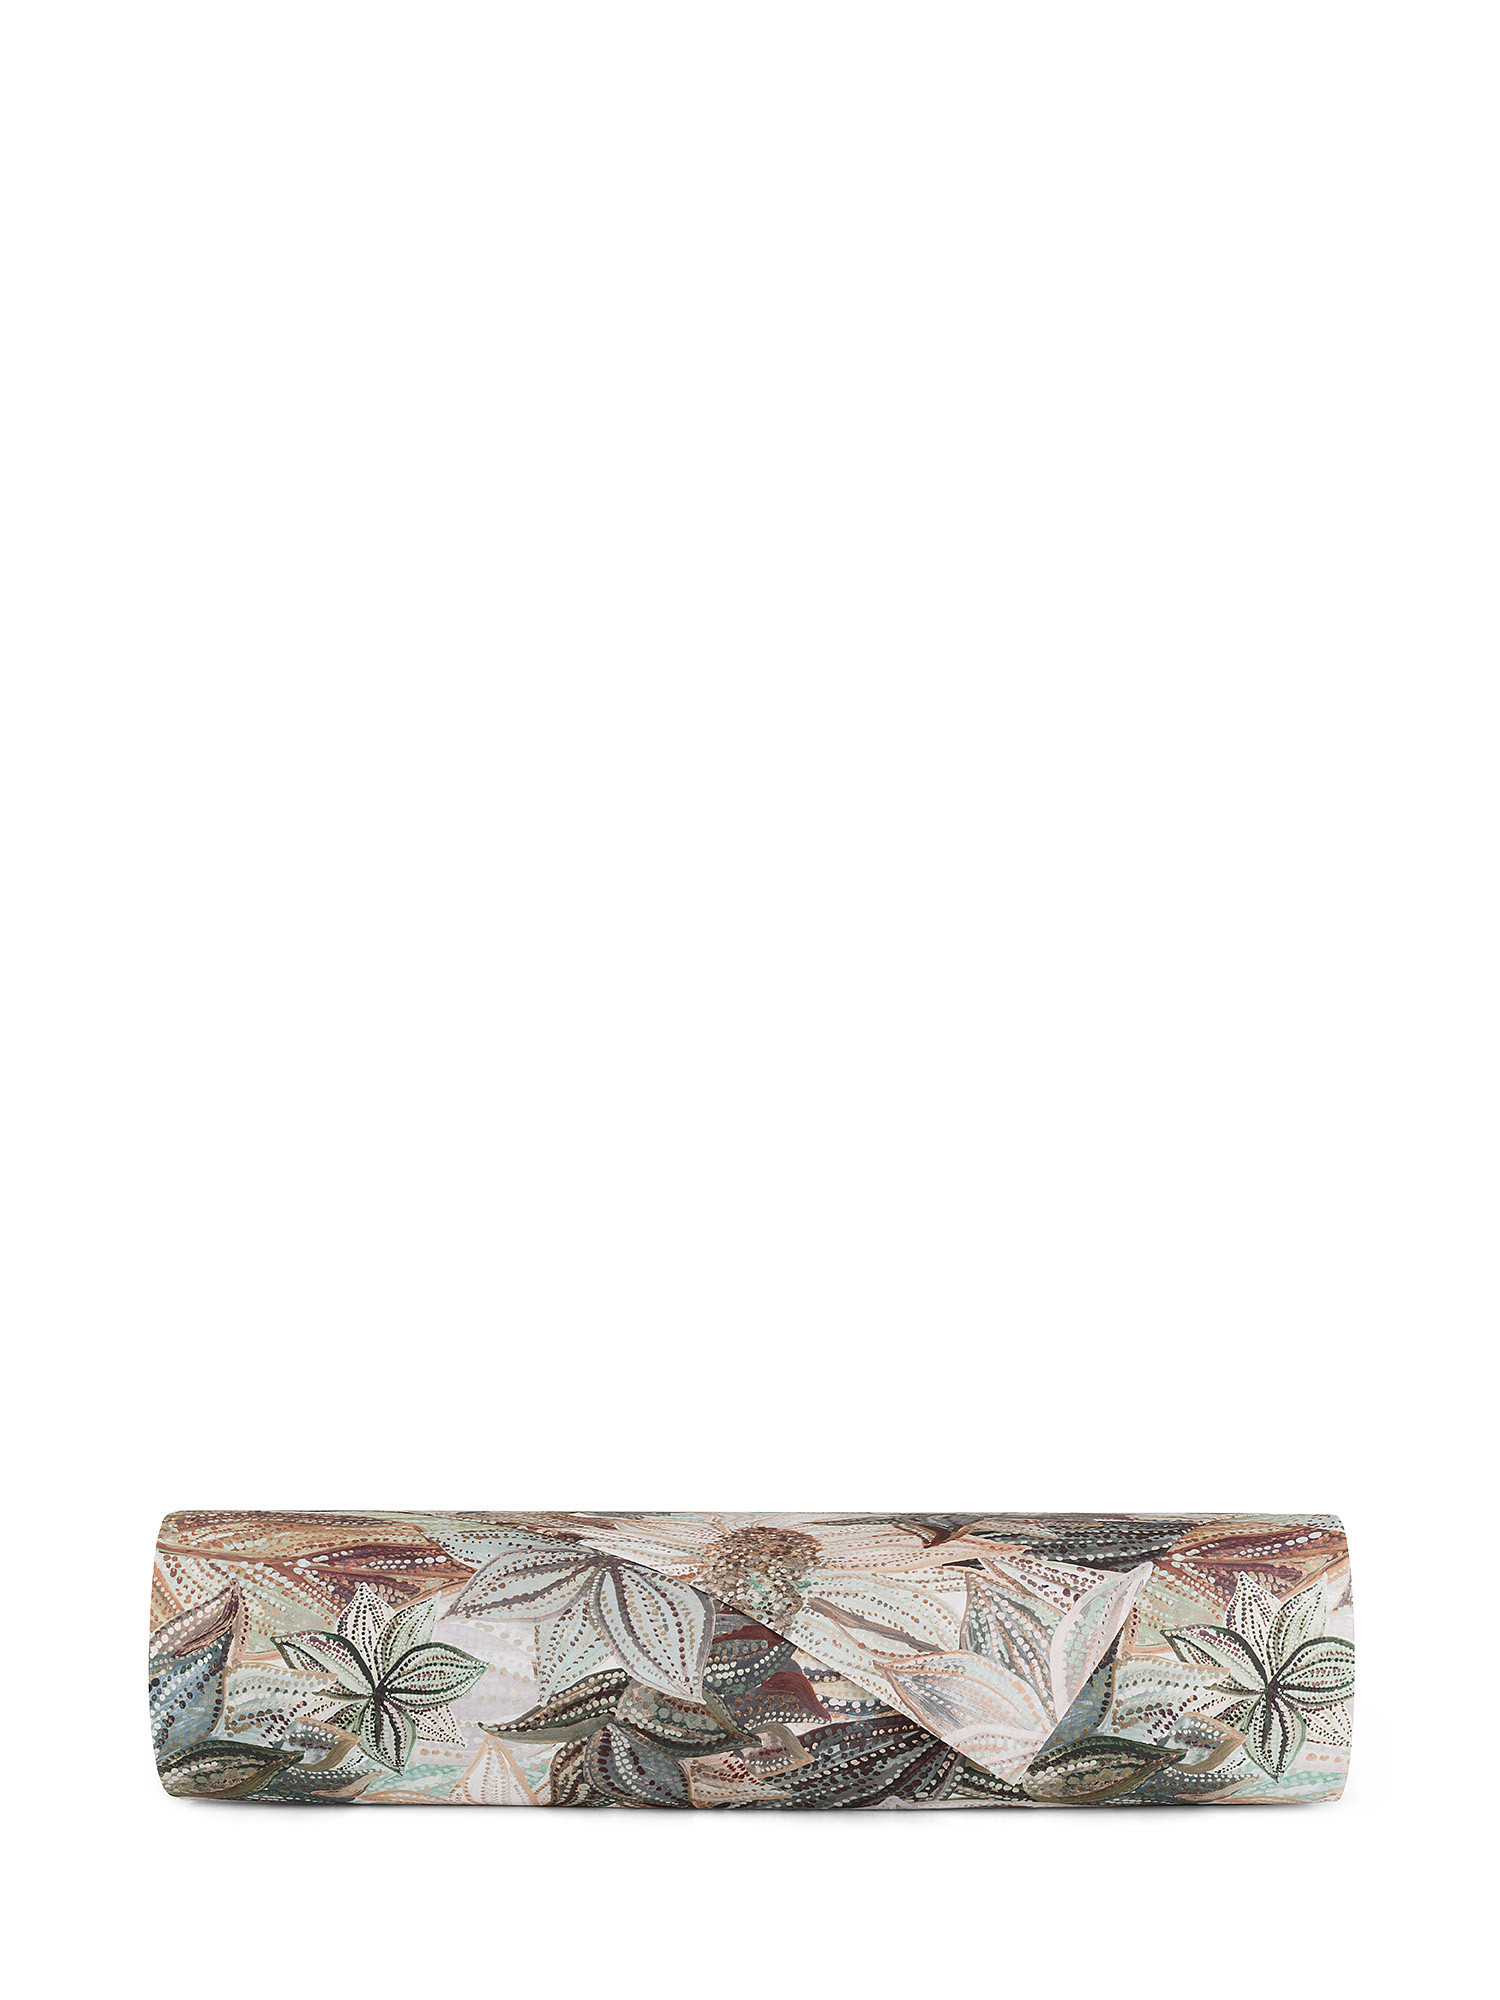 Lenzuolo liscio cotone percalle fantasia floreale, Verde, large image number 1